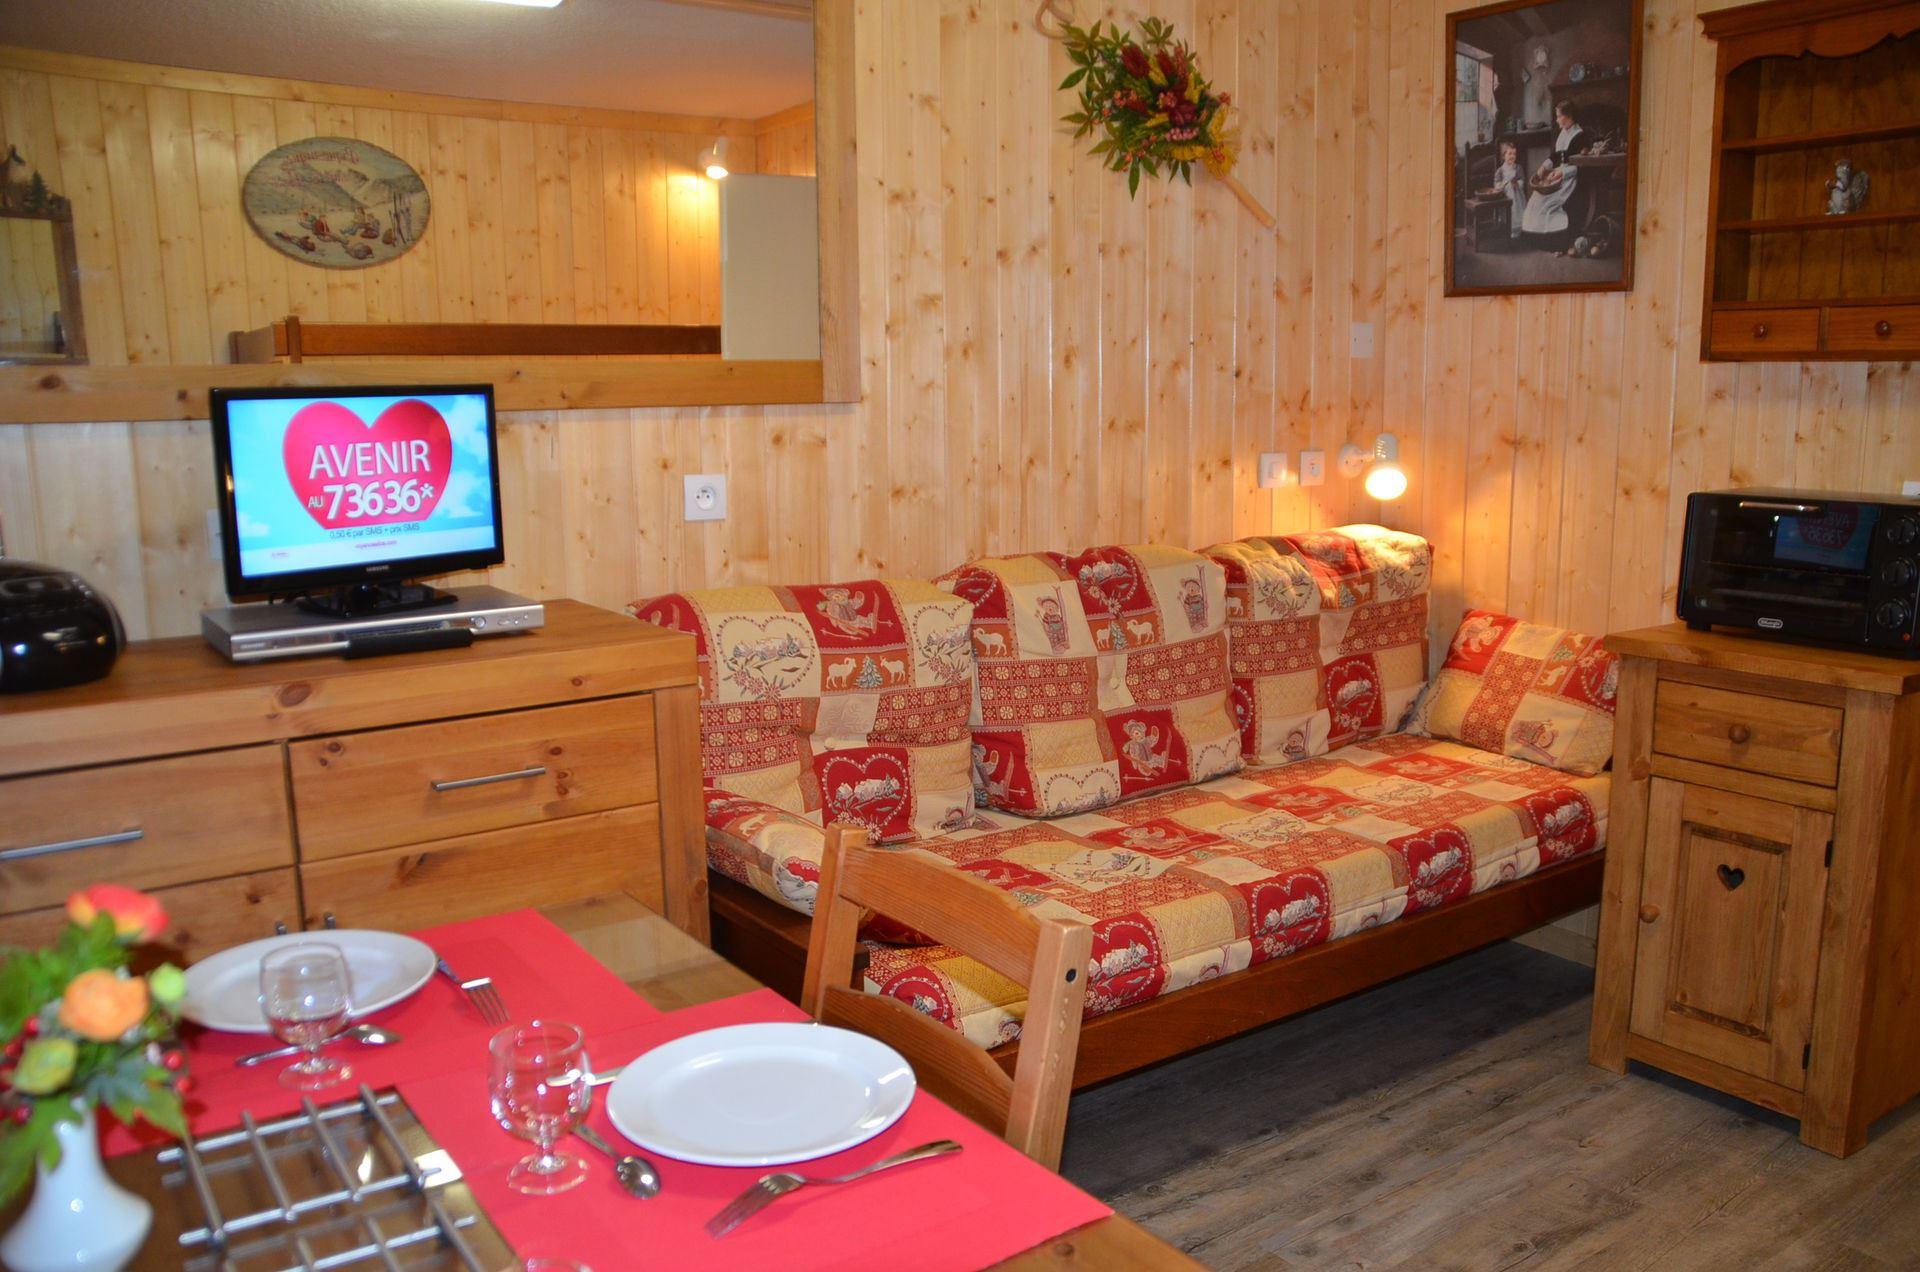 2 Pers Studio ski-in ski-out / CHAVIERE 729